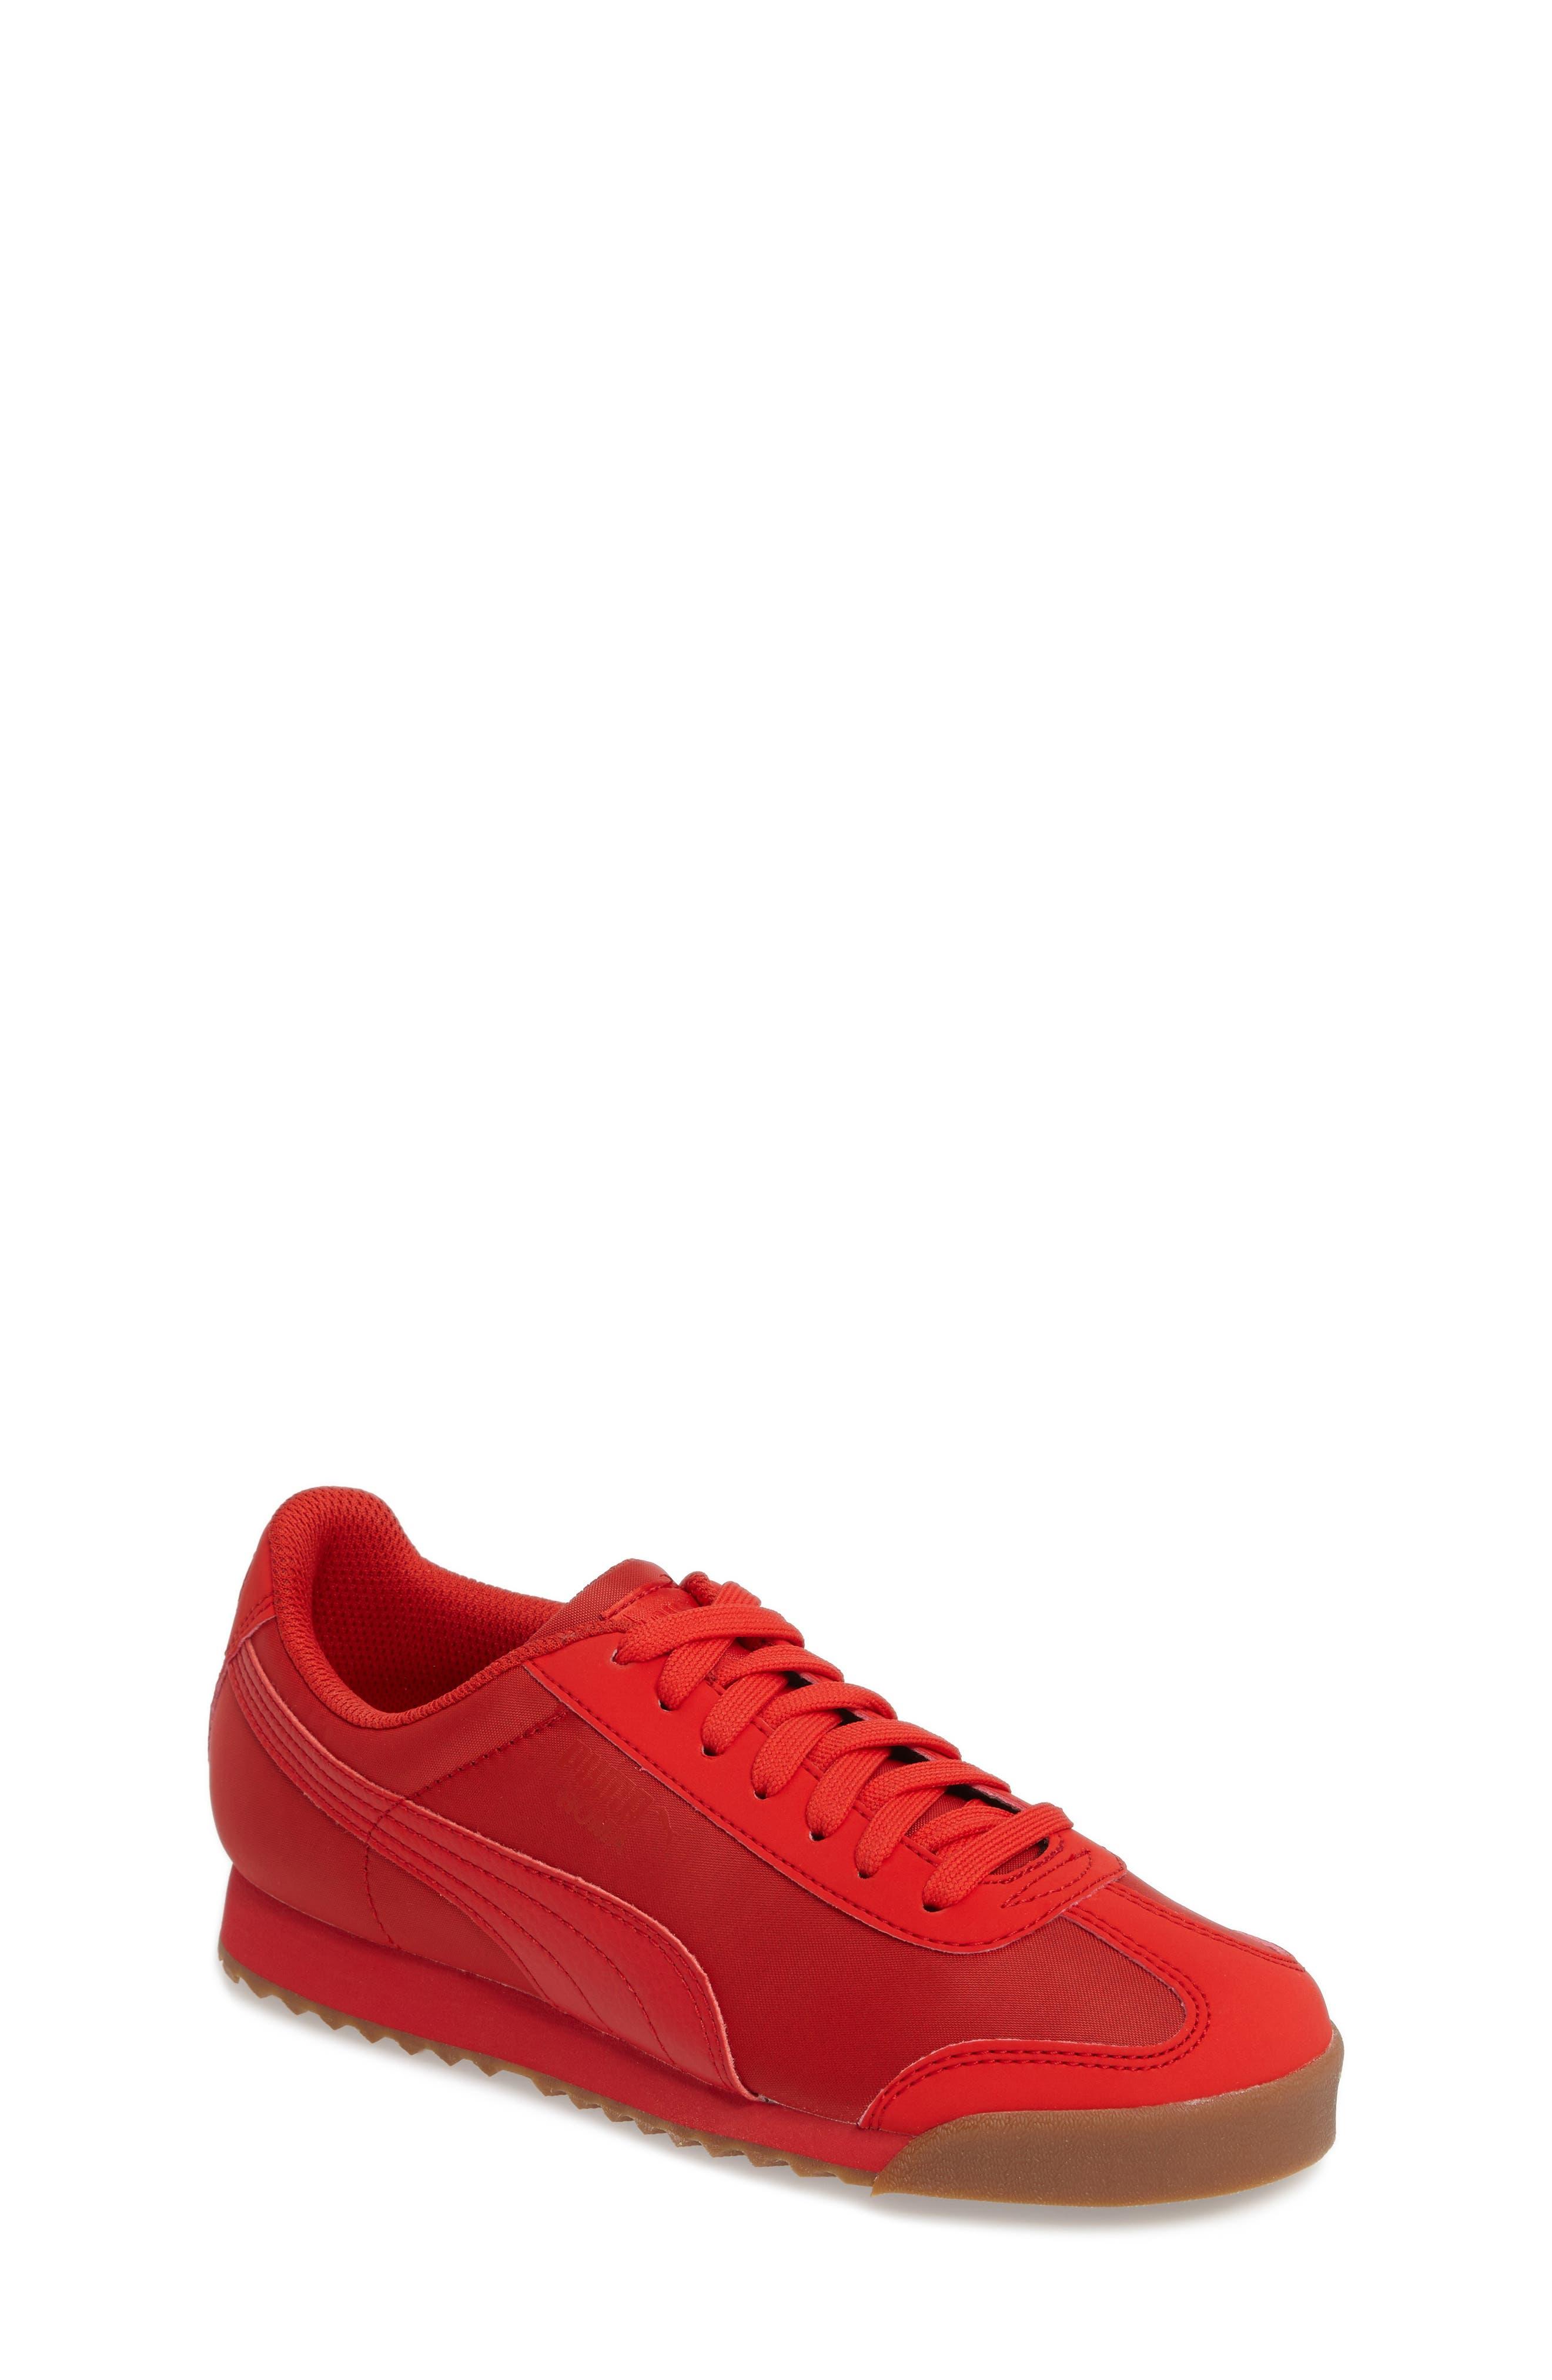 Alternate Image 1 Selected - PUMA Roma Basic Summer Sneaker (Big Kid)